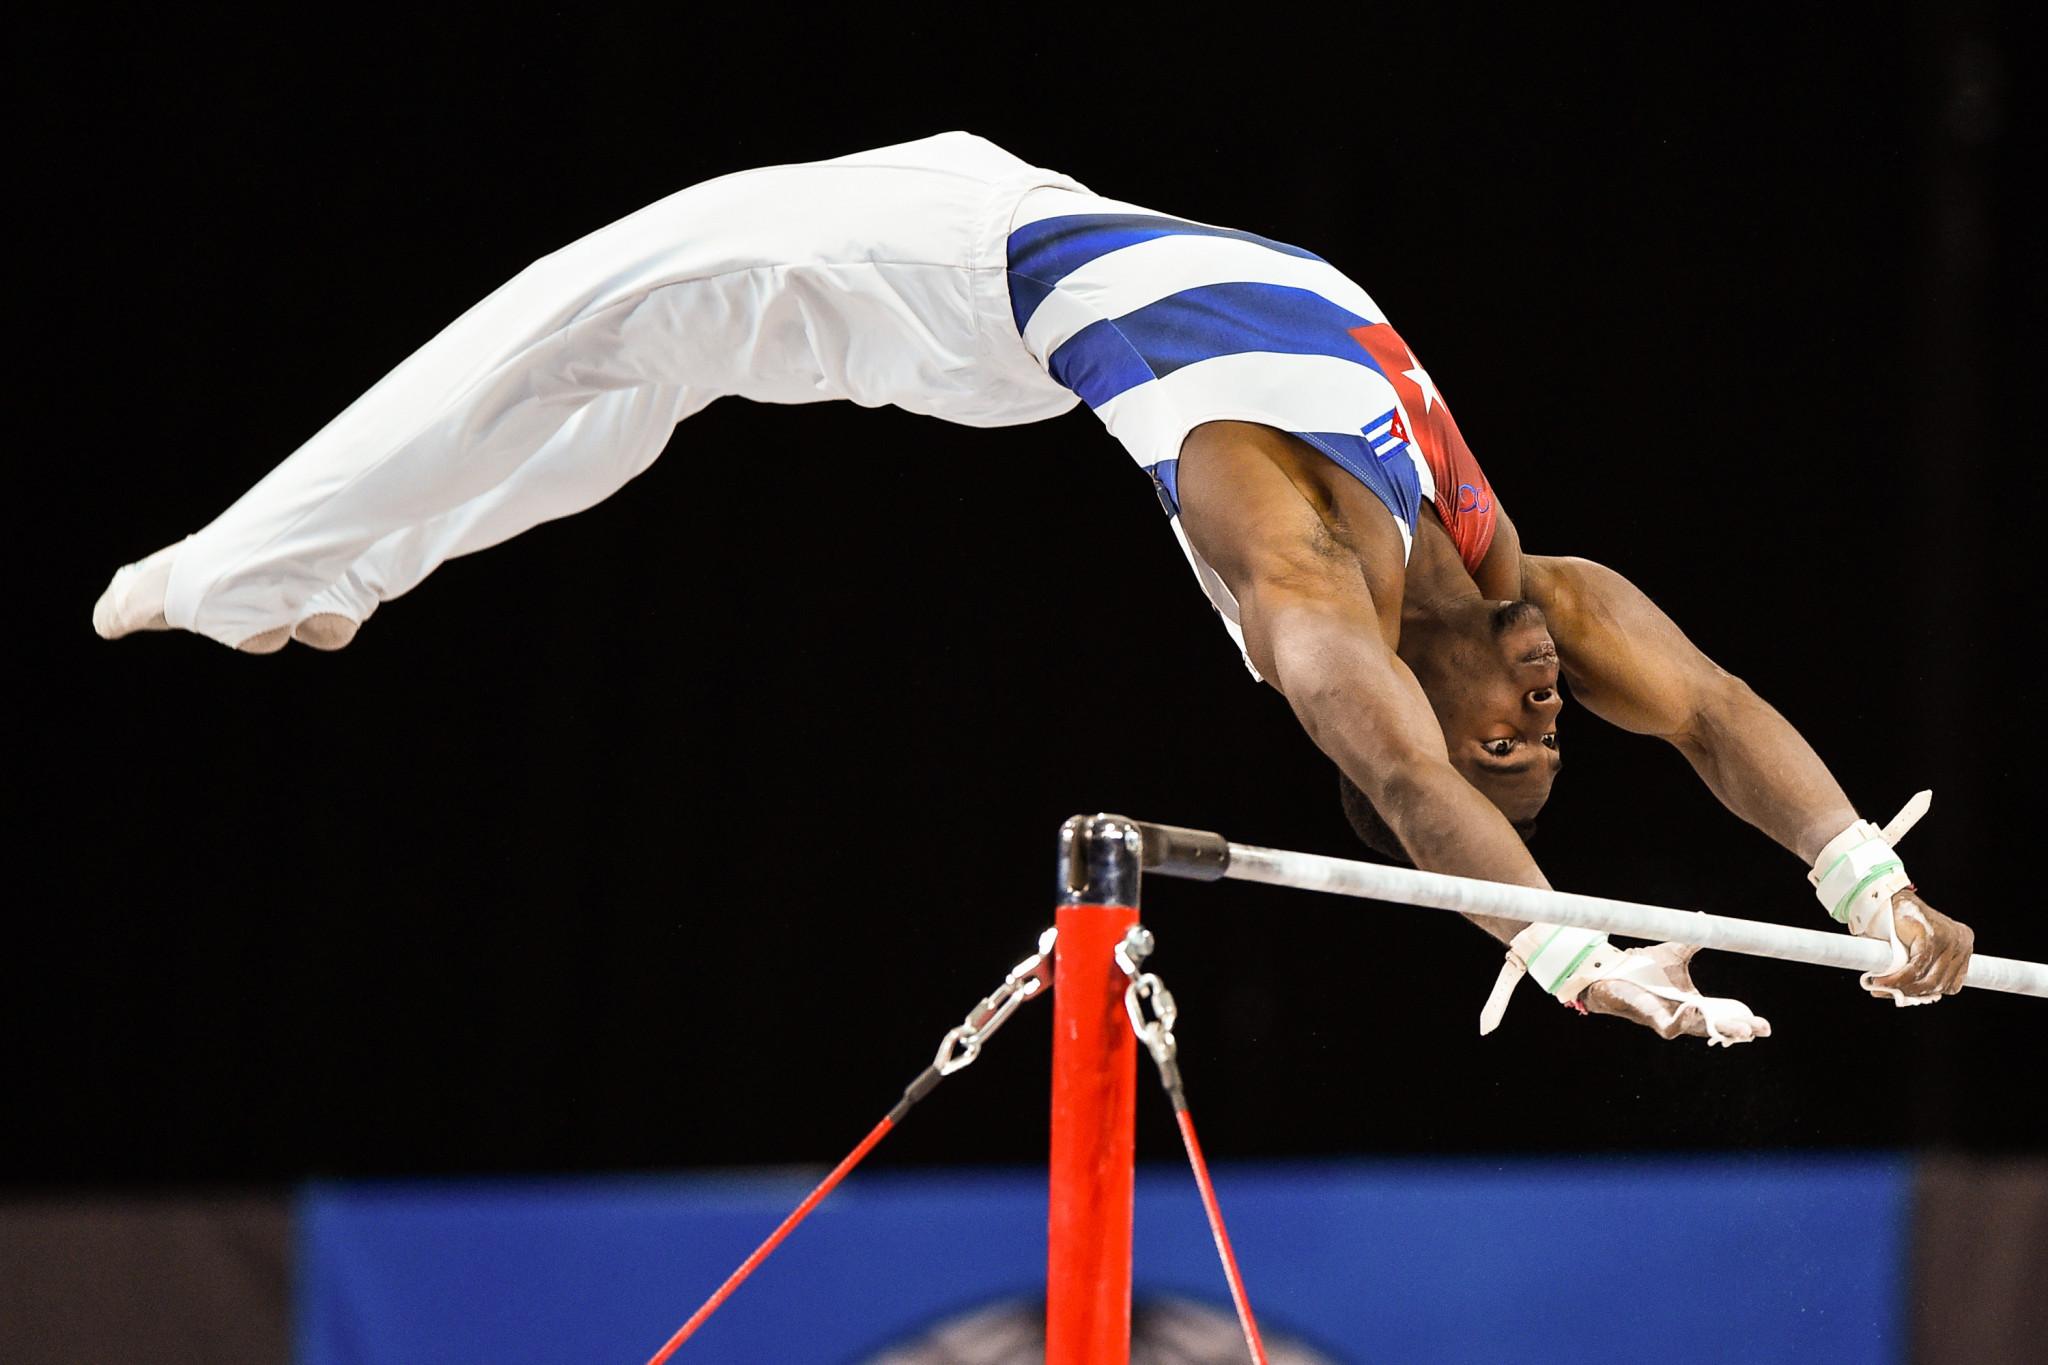 Larduet tops men's all-around qualification at Artistic Gymnastics World Championships